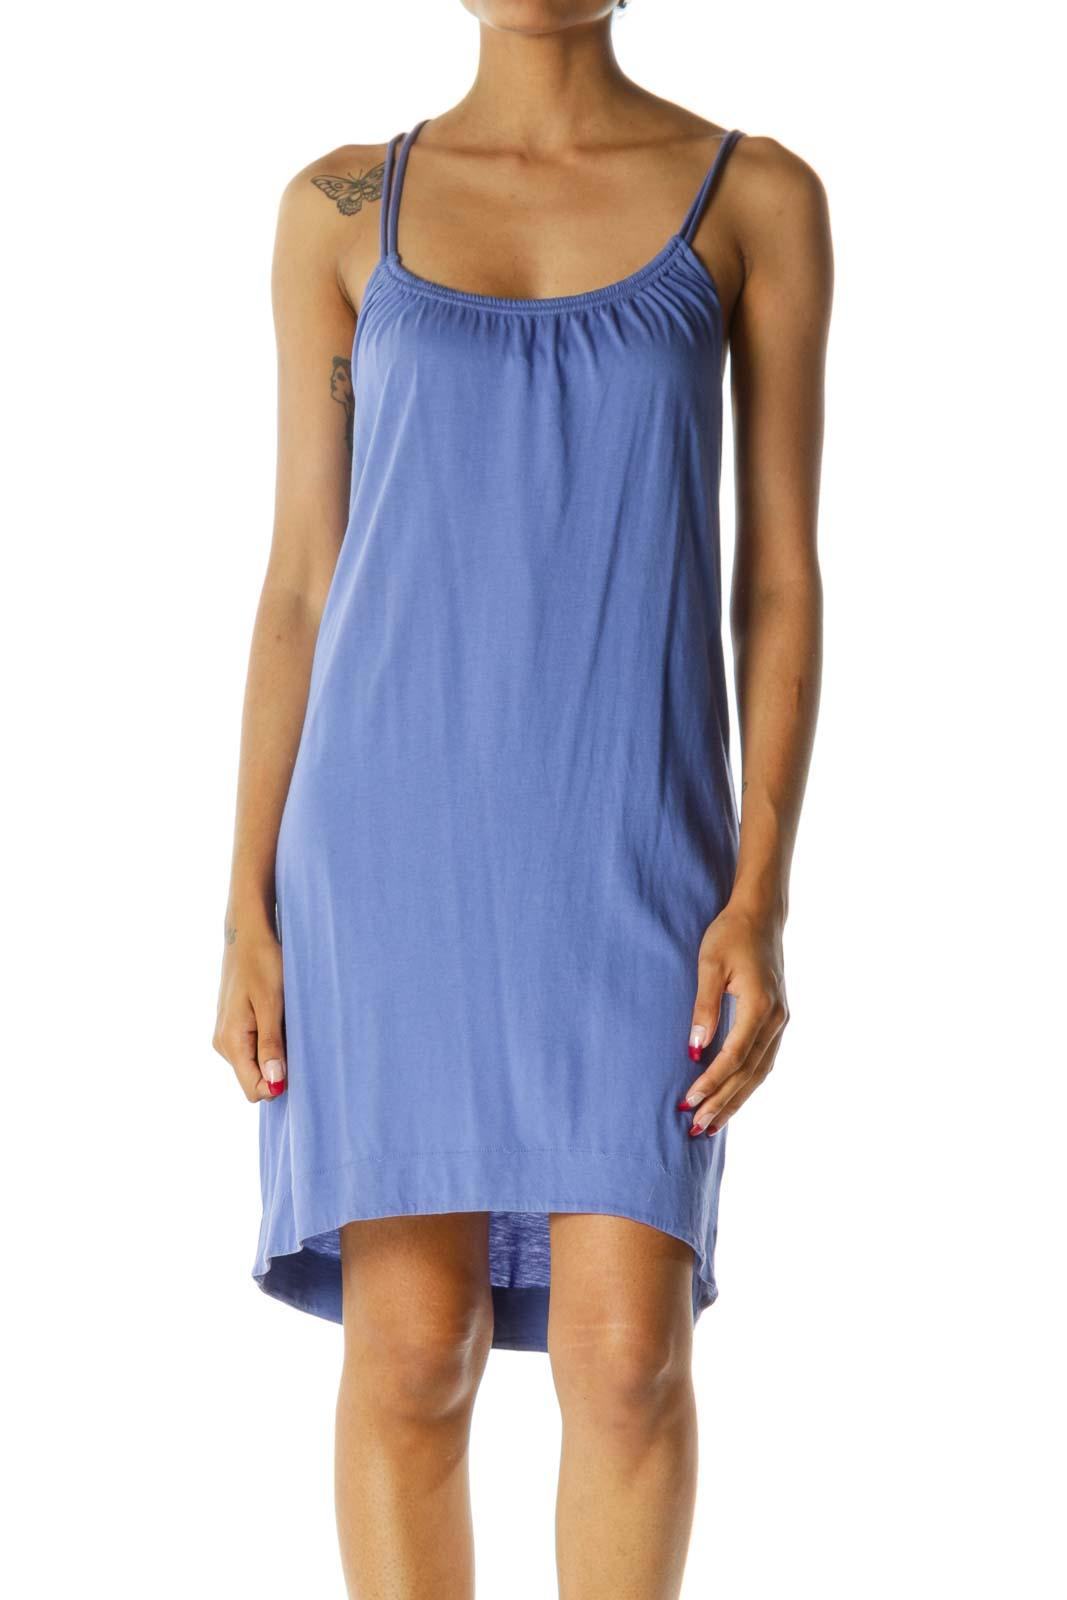 Blue Elastic Neckline Spaghetti Strap Soft Lightweight Dress Front